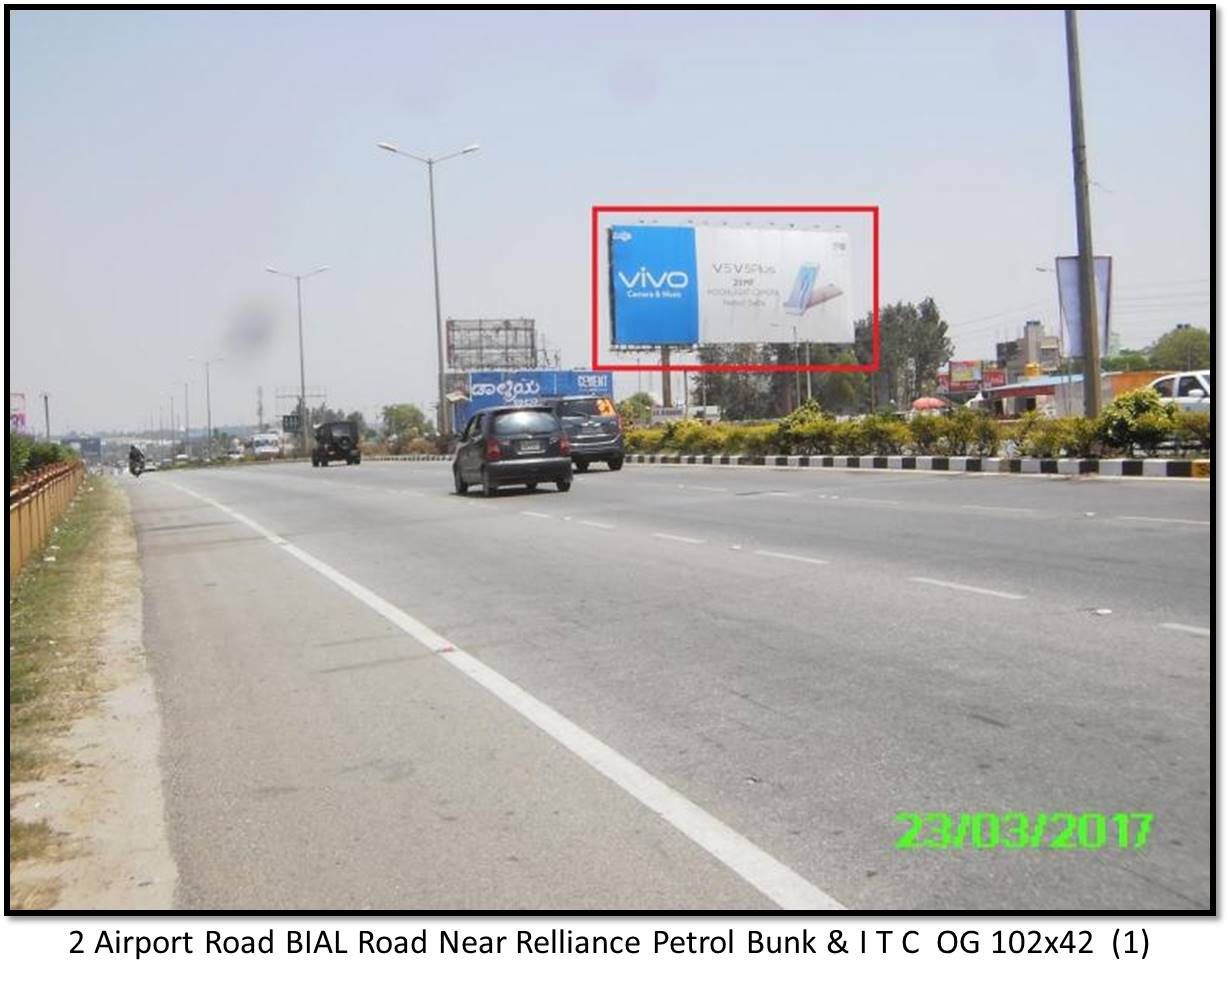 Airport Road BIAL Road Near Relliance Petrol Bunk & I T C, Bengaluru